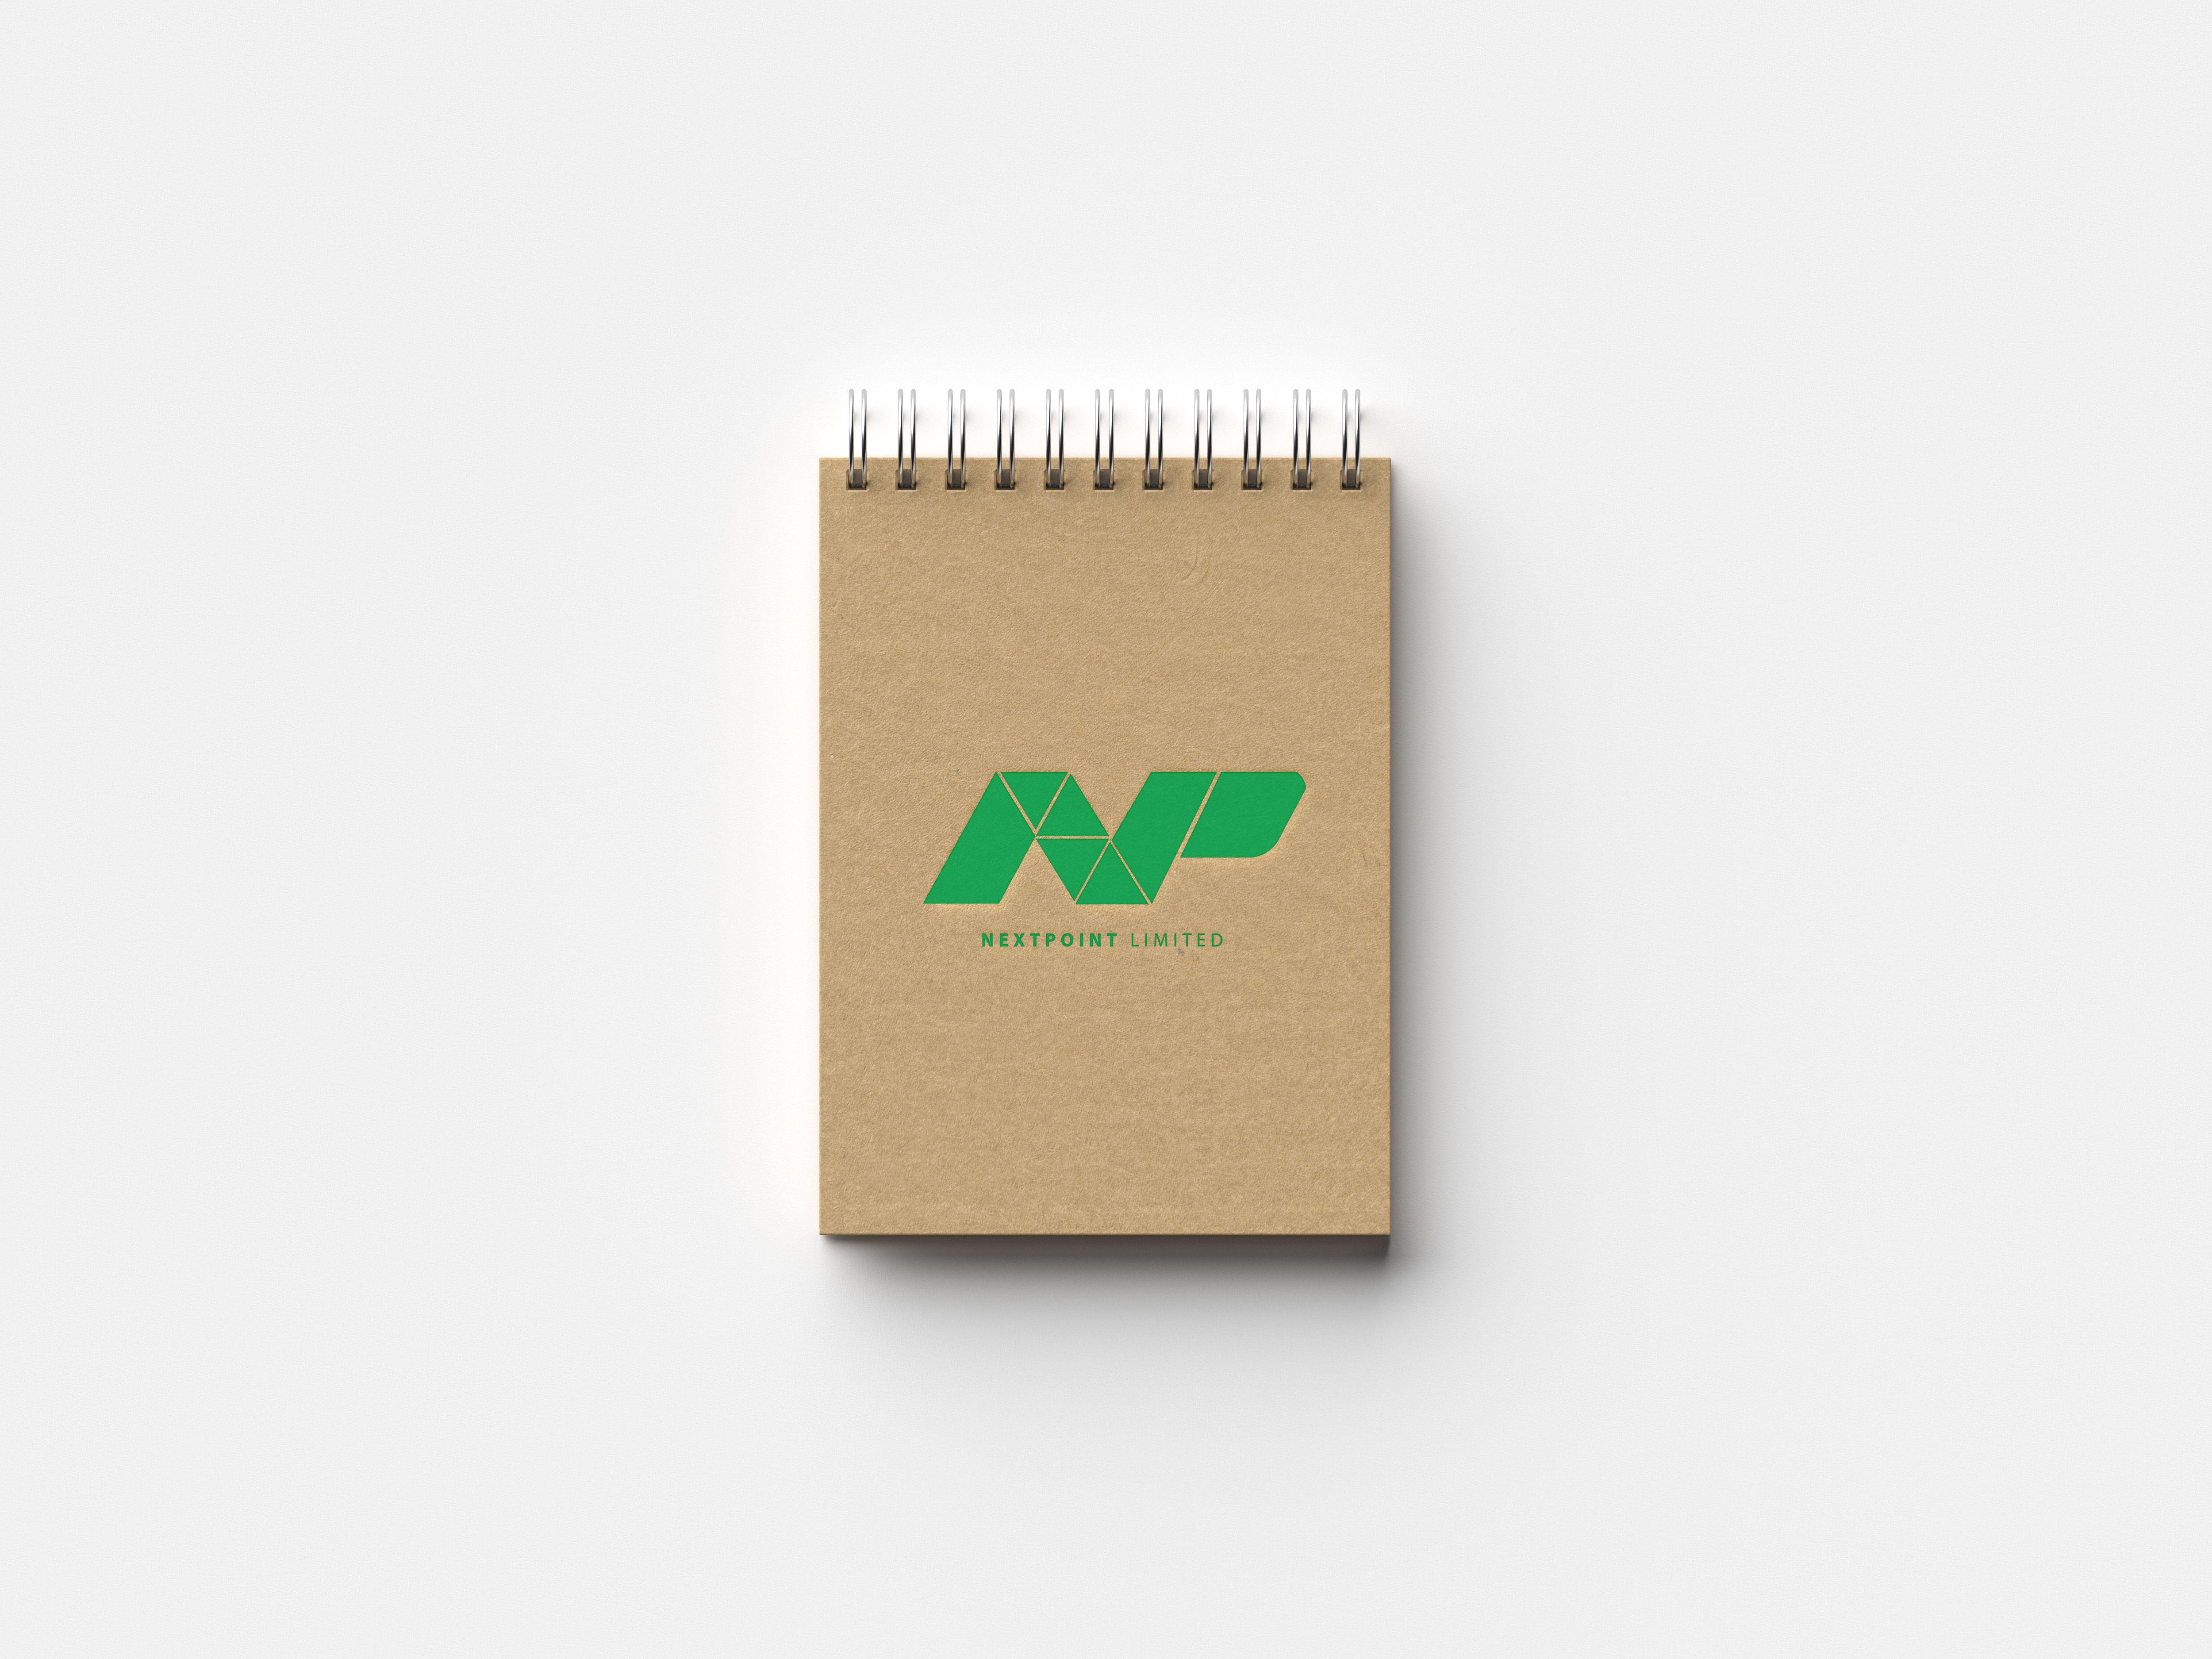 Nextpoint-Notepad